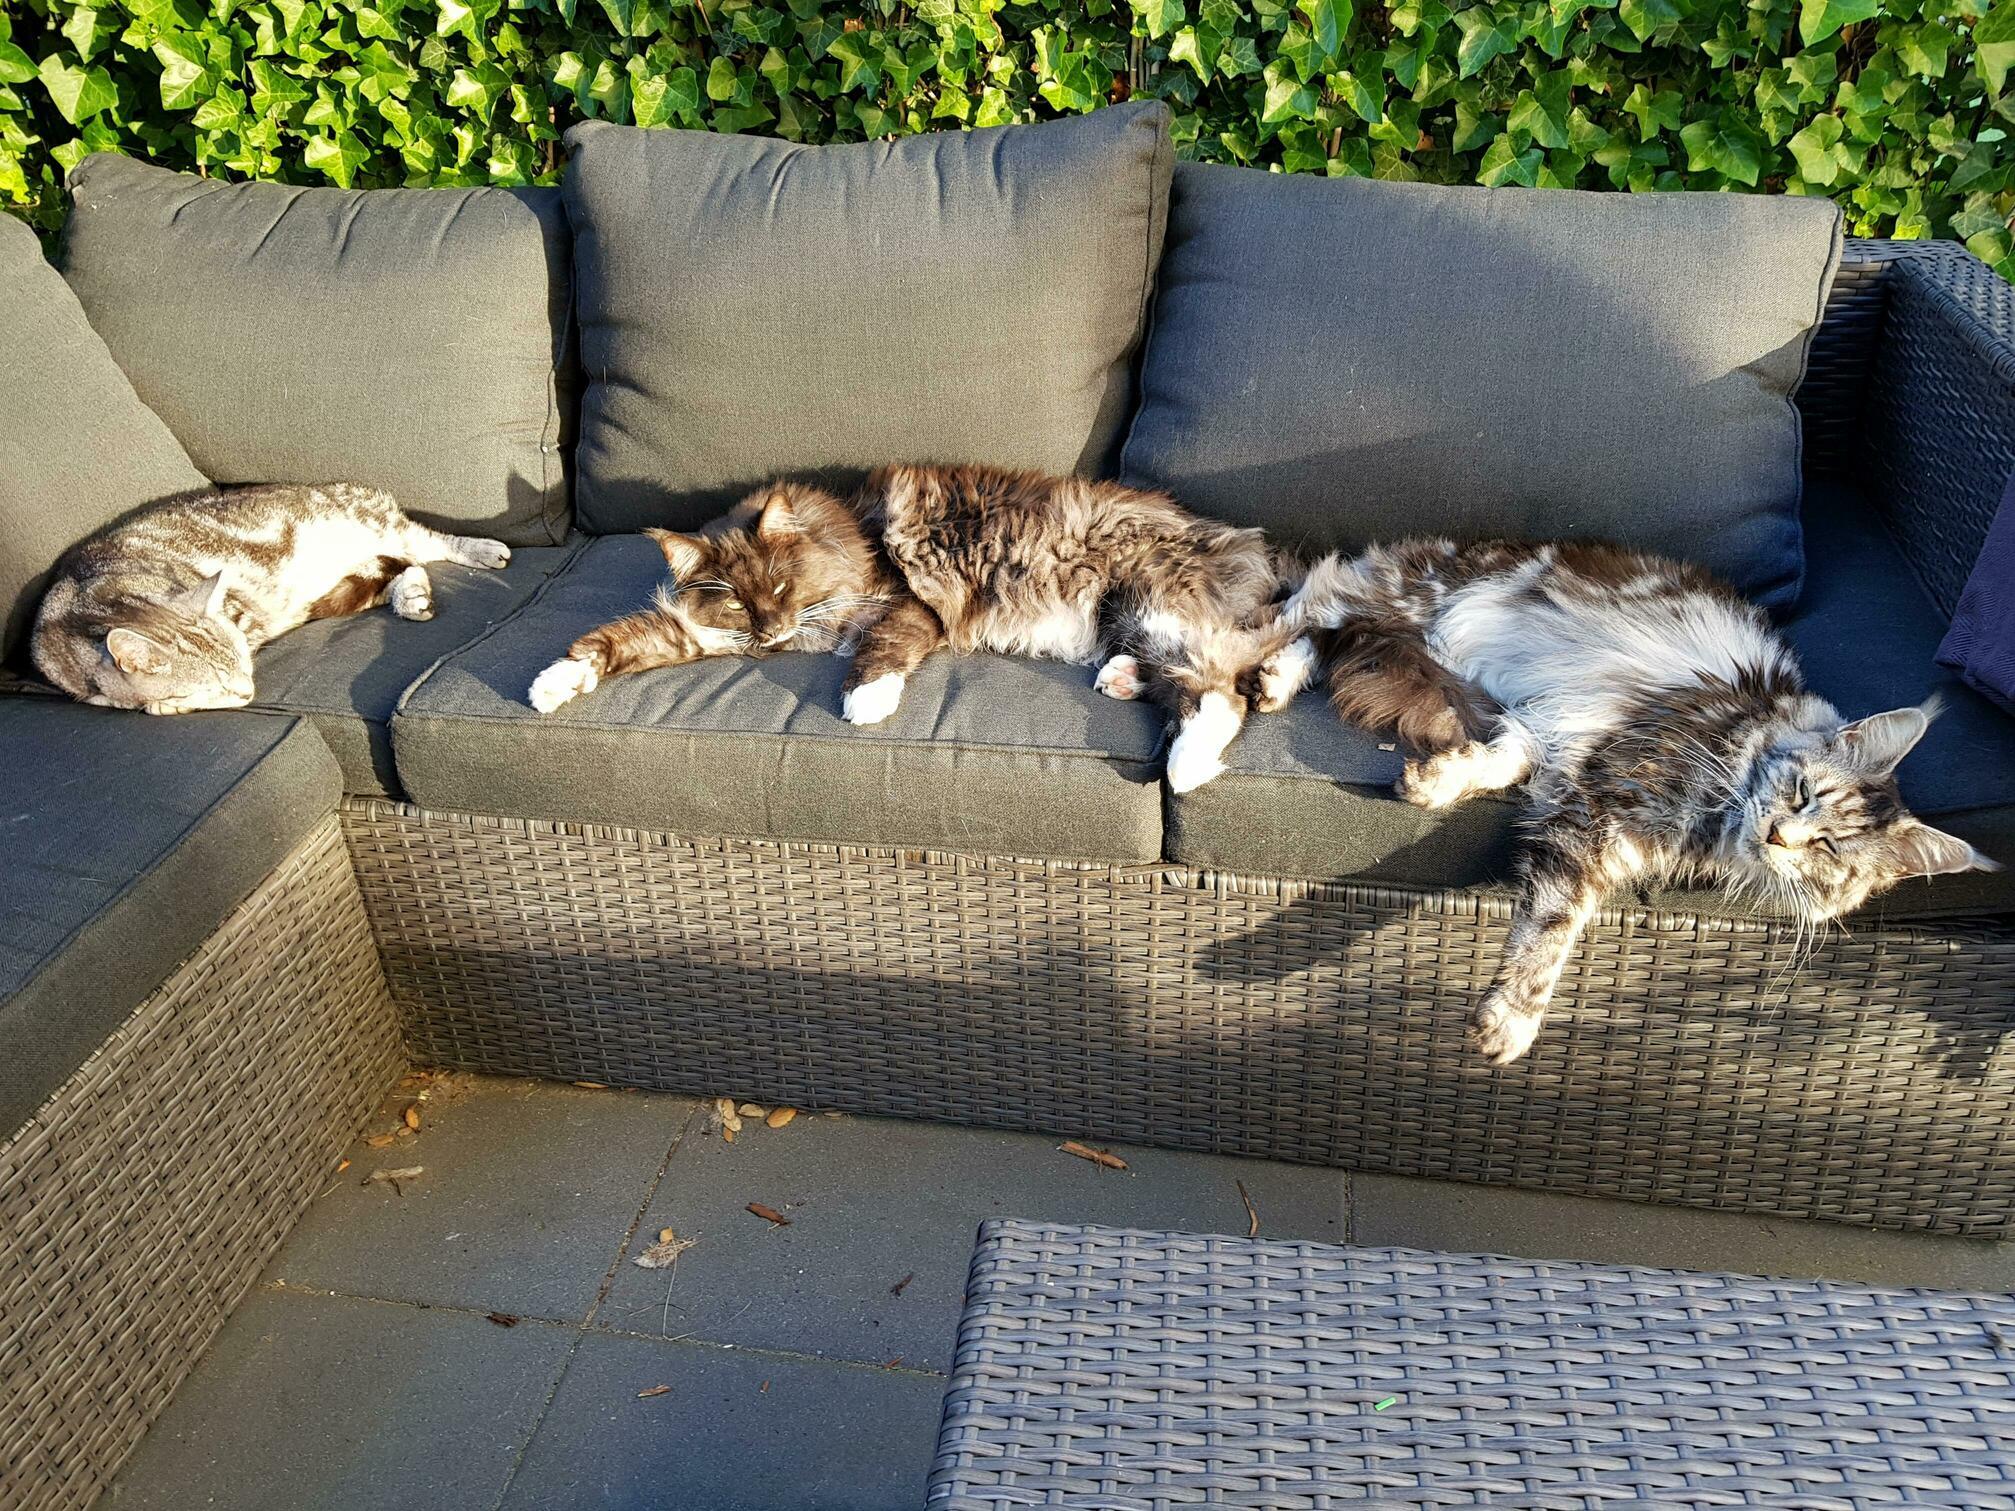 Just my 3 cats enjoying the evening sun